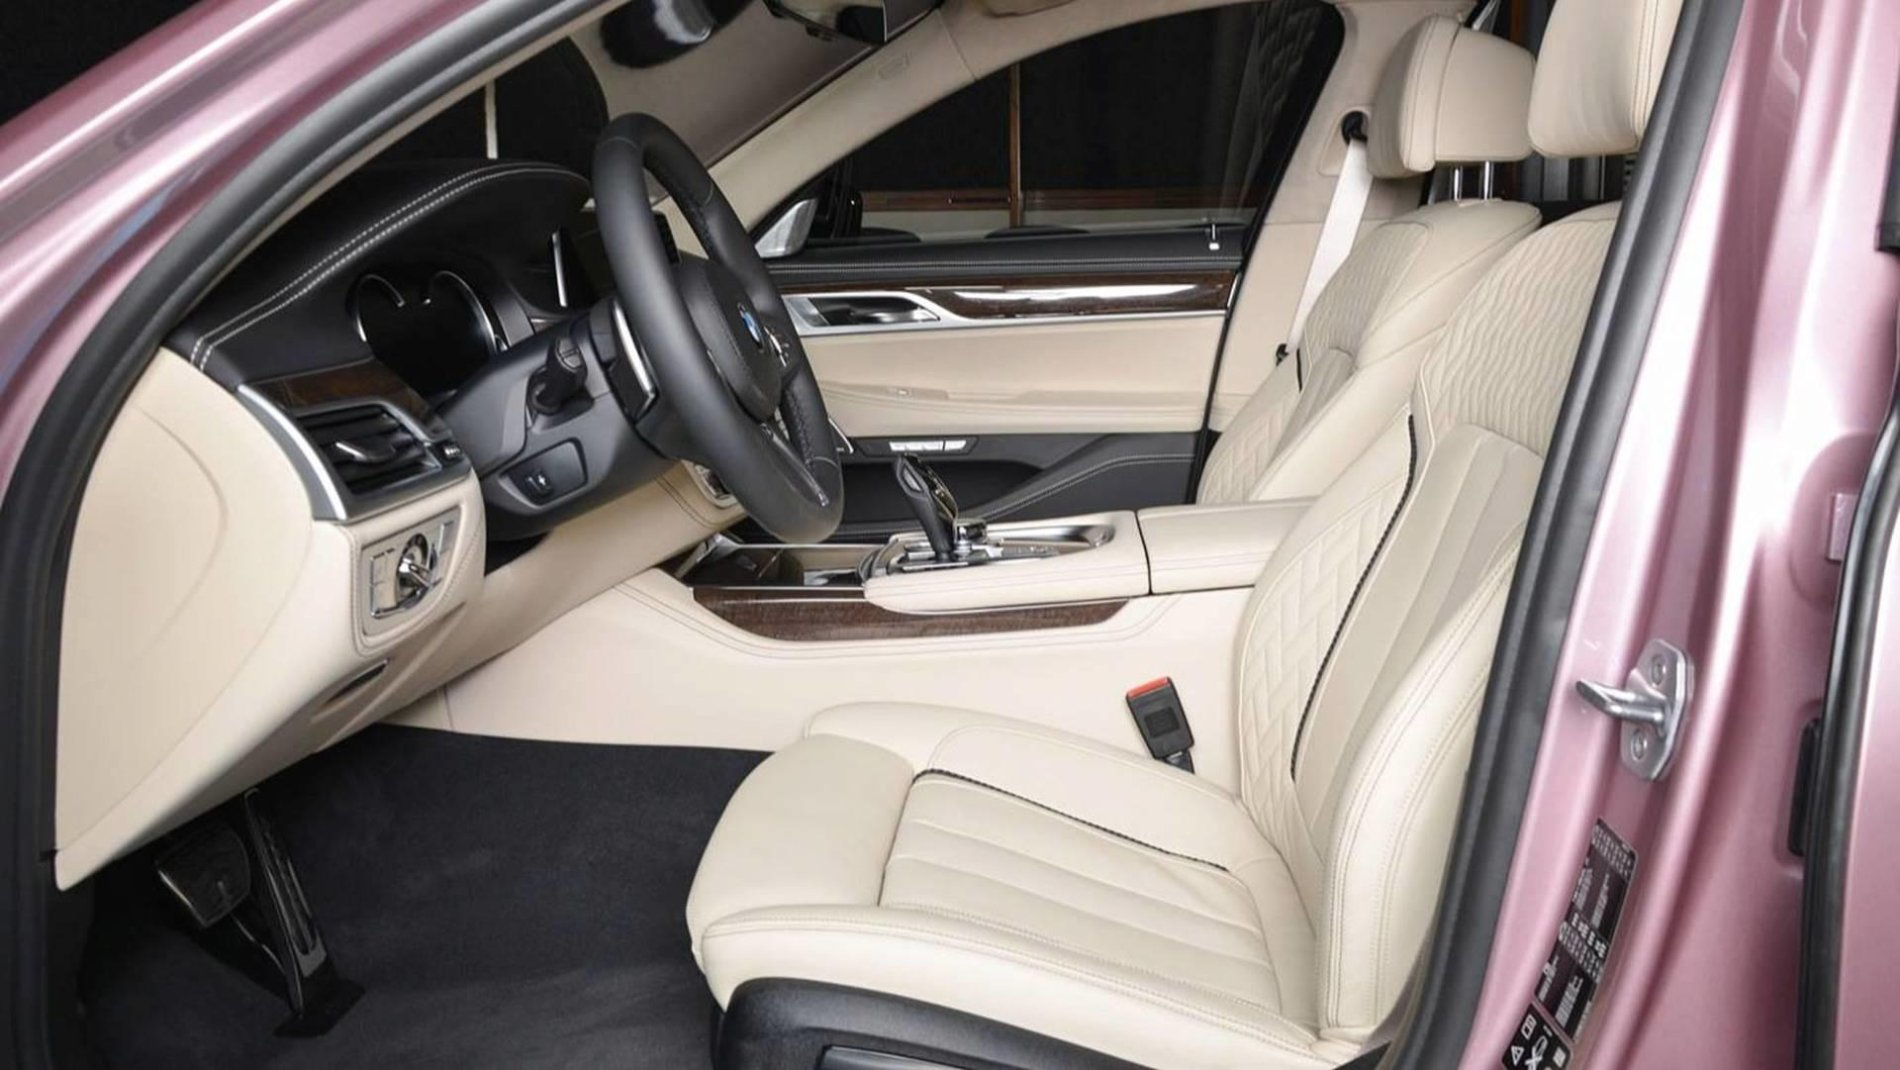 BMW 750Li xDrive in Rose Quartz - BMW 750Li xDrive in Rose Quartz